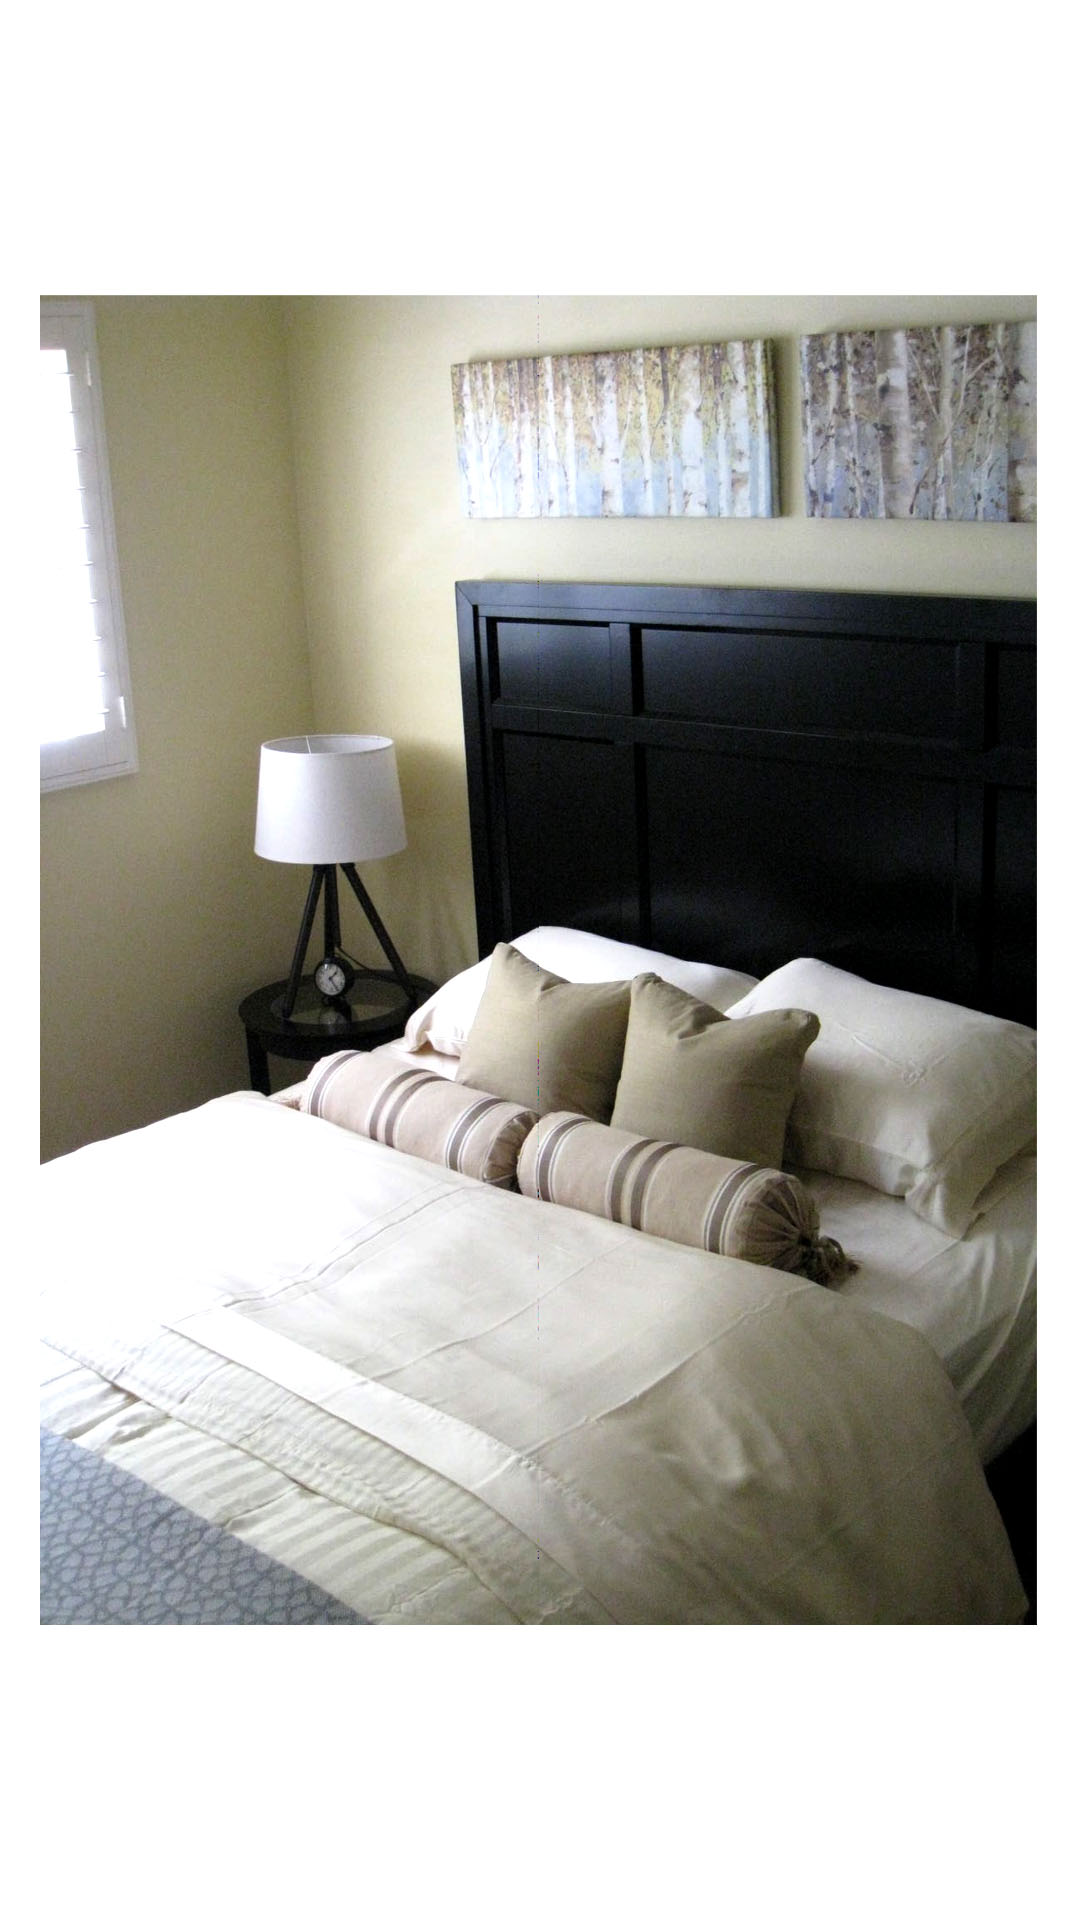 Interior Design Of Guest Room: Interior Design Los Angeles